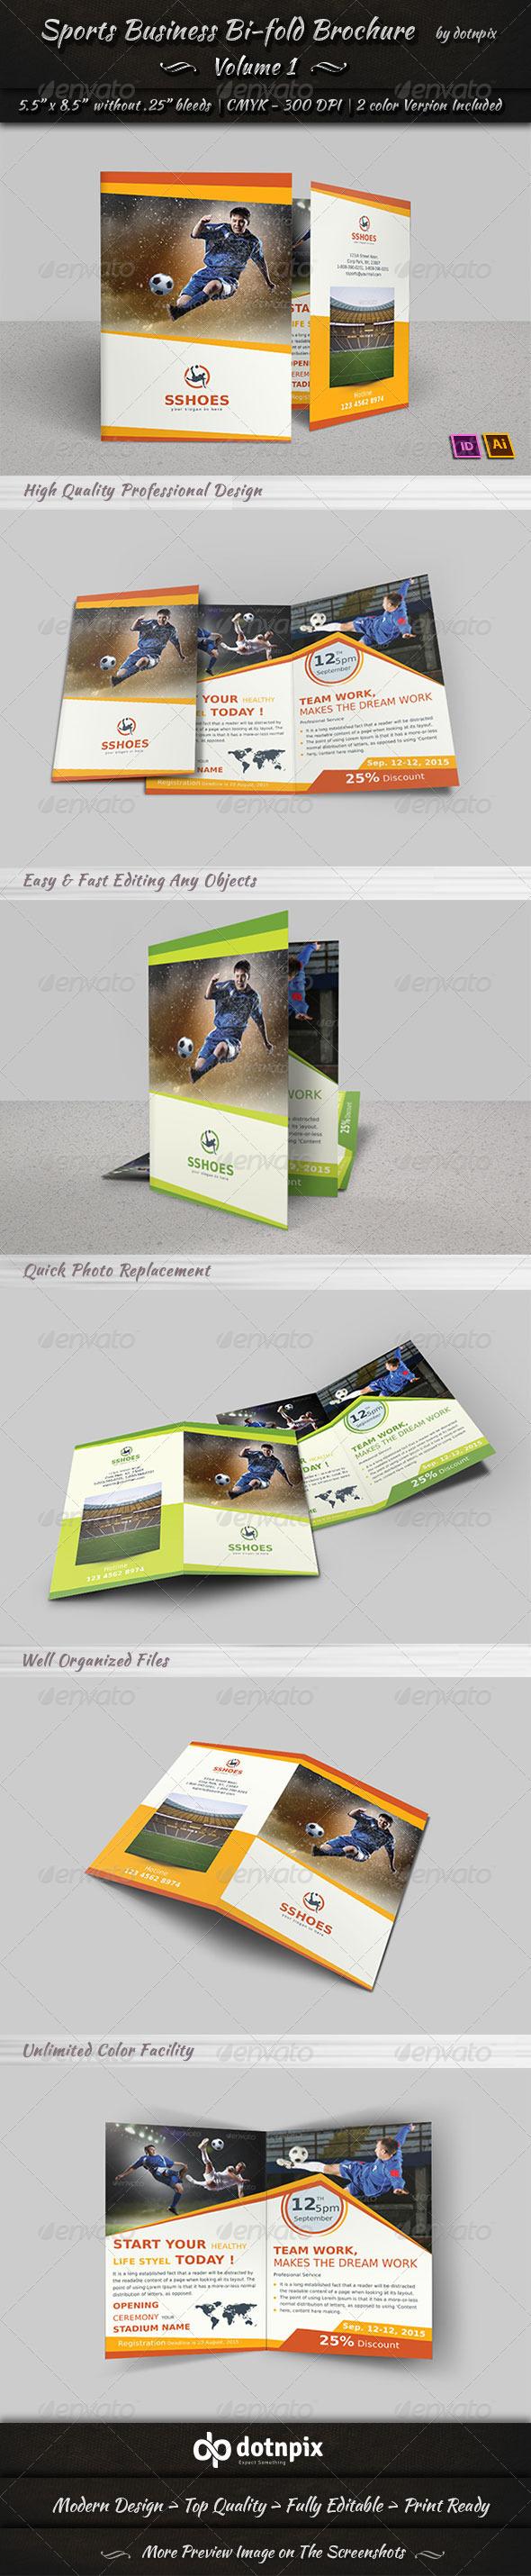 Sports Business Bi-Fold Brochure | Volume 1 - Corporate Brochures